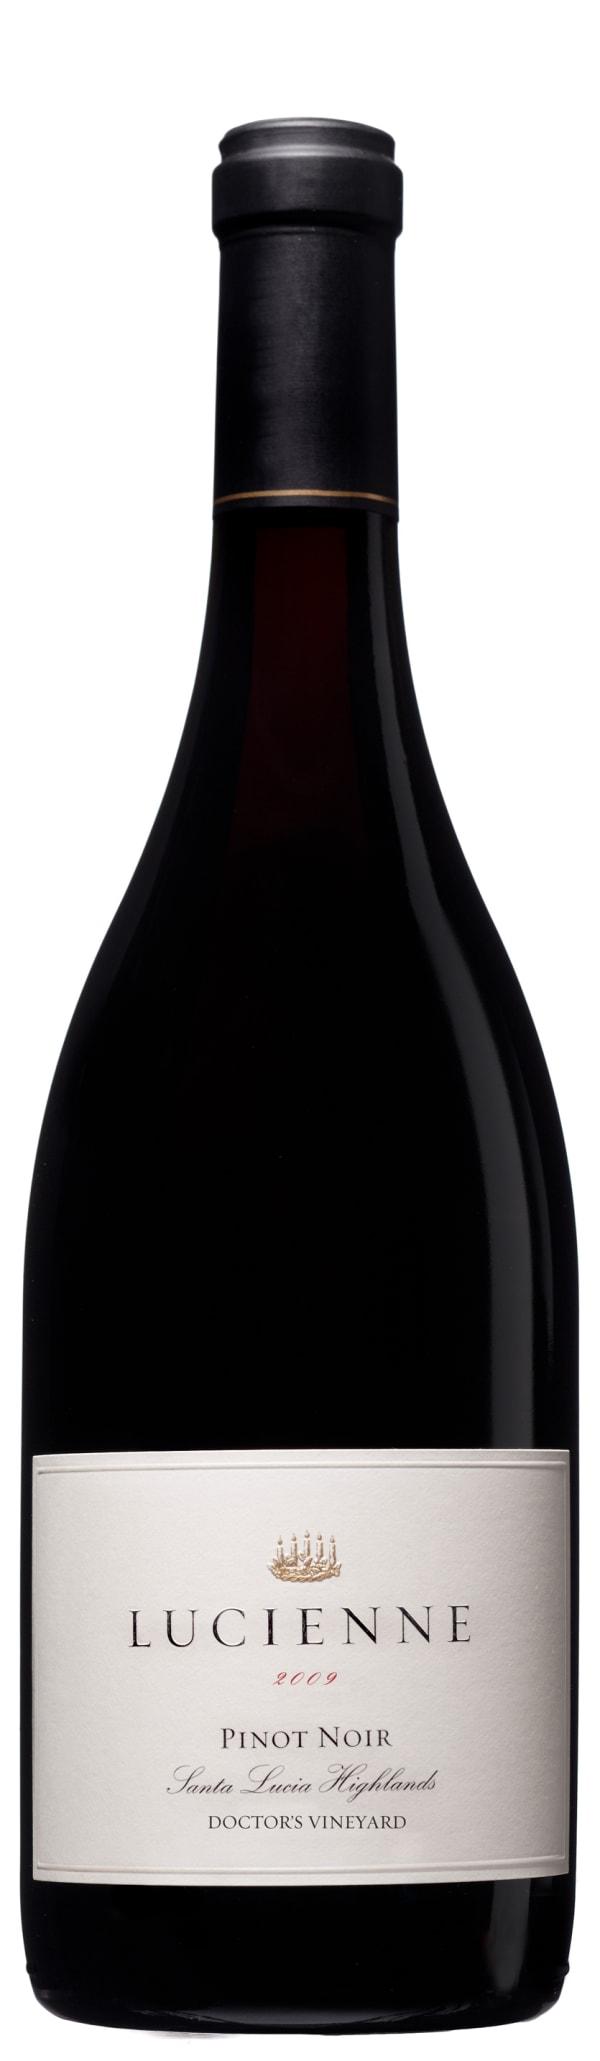 Lucienne Pinot Noir Doctor's Vineyard 2014